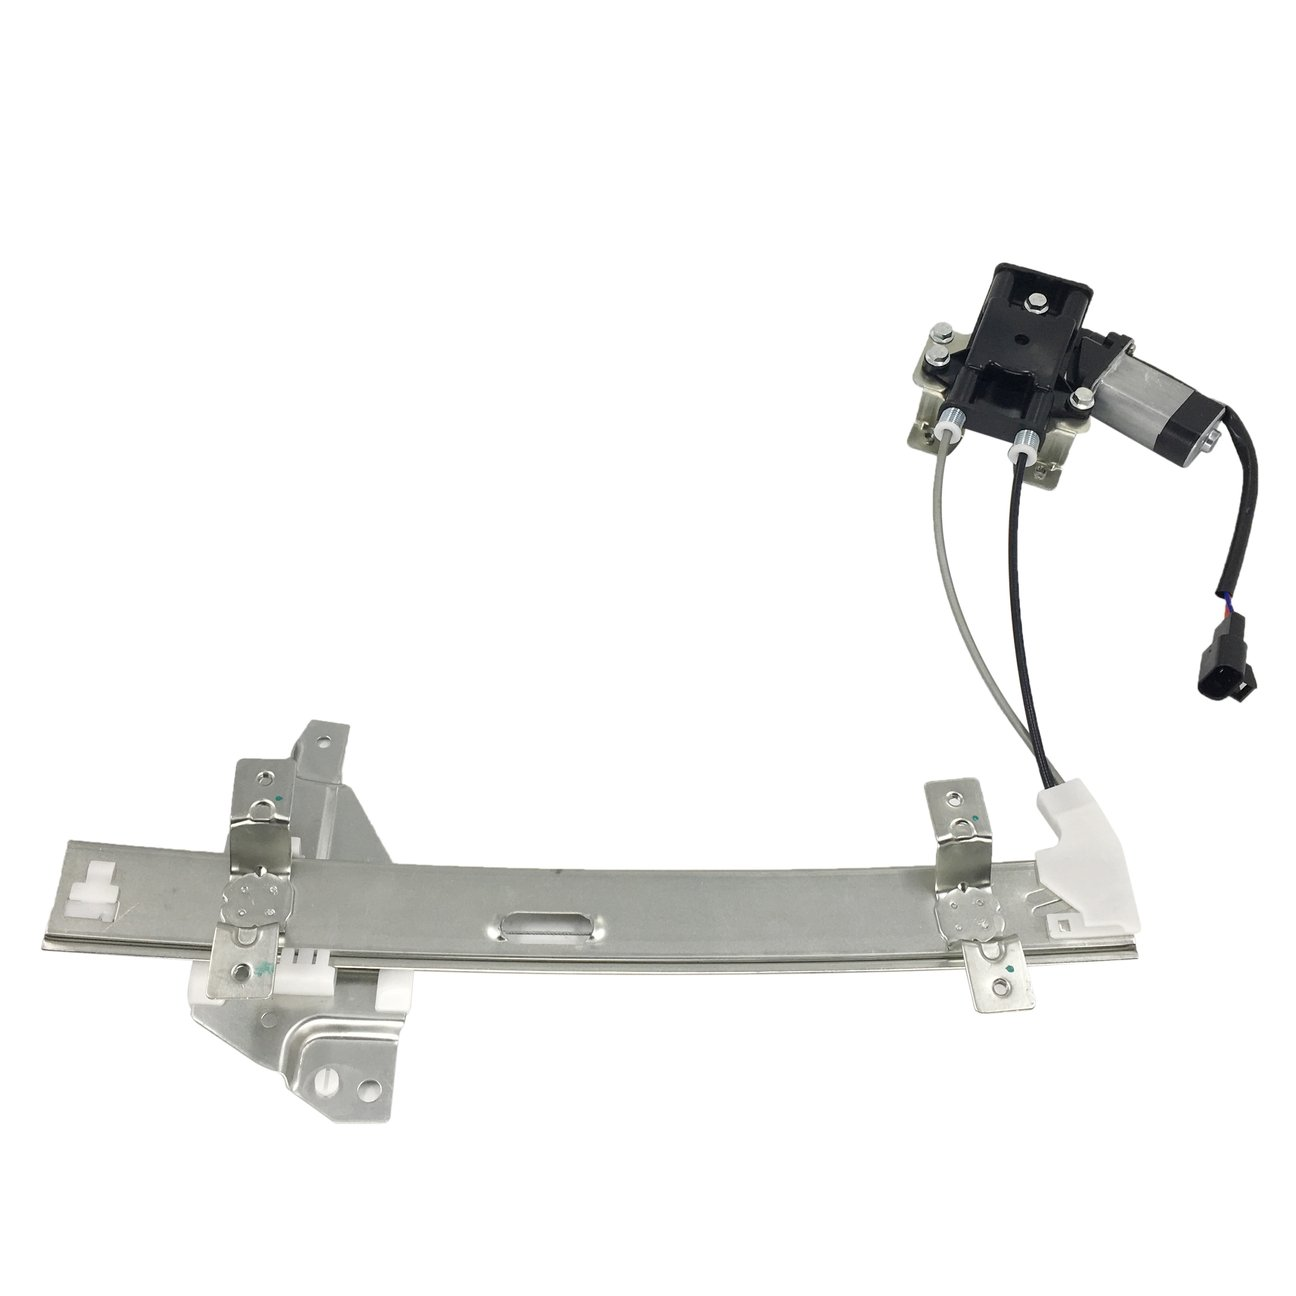 SKP SK741709 Power Window Motor and Regulator Assembly